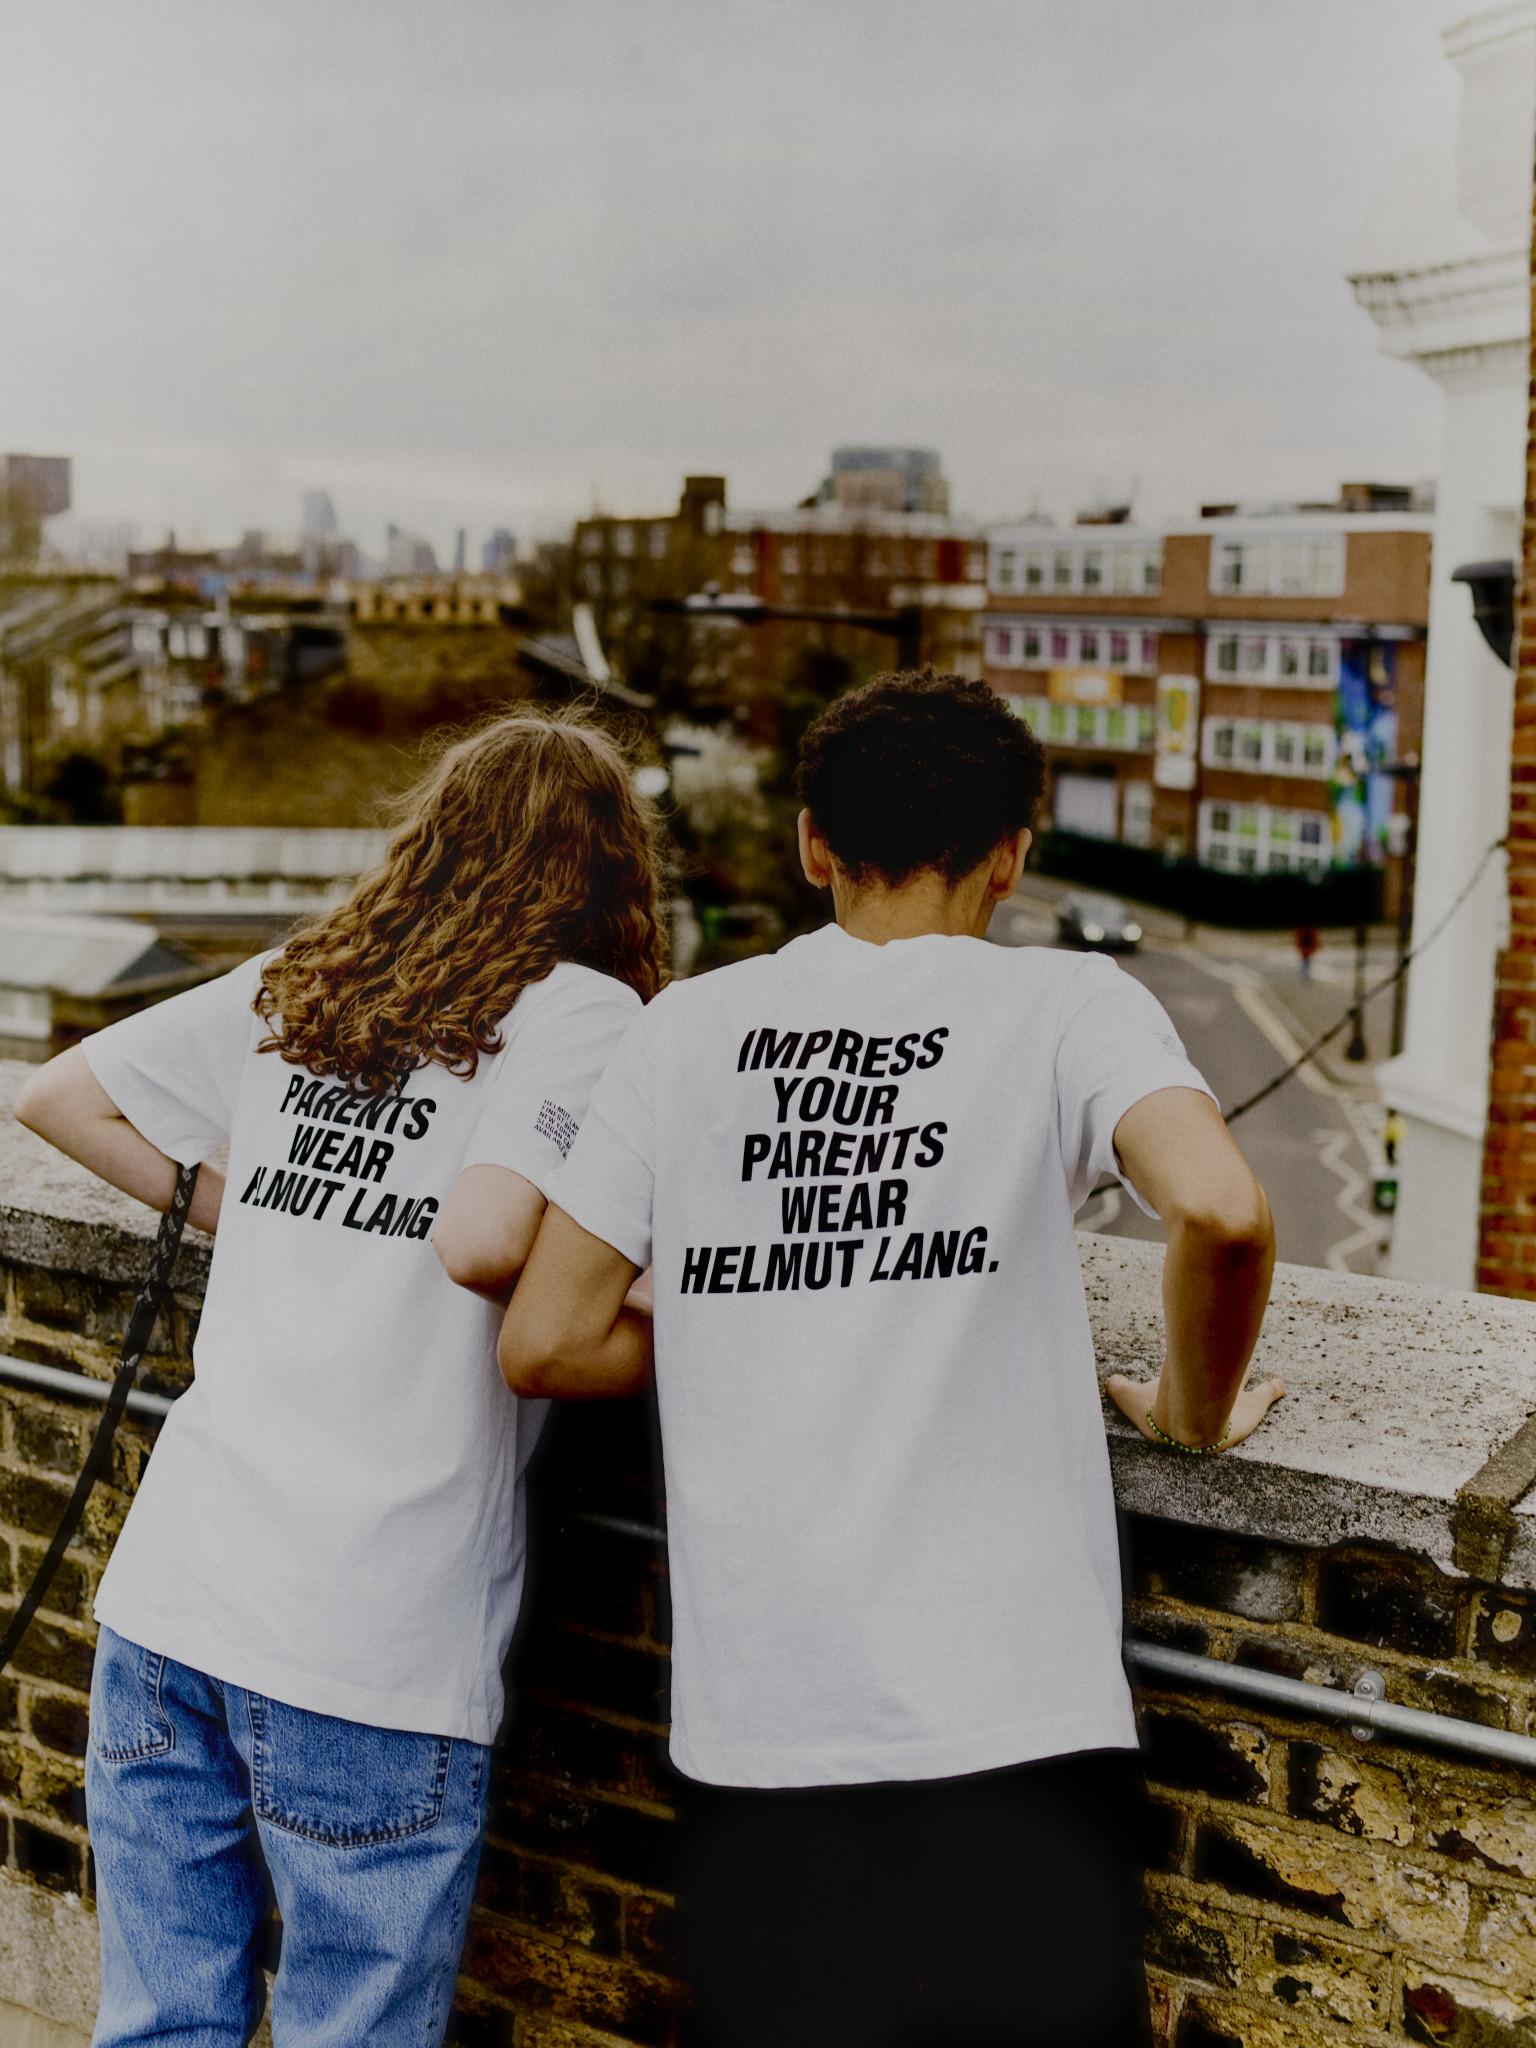 Helmut Lang Slogan Campaign